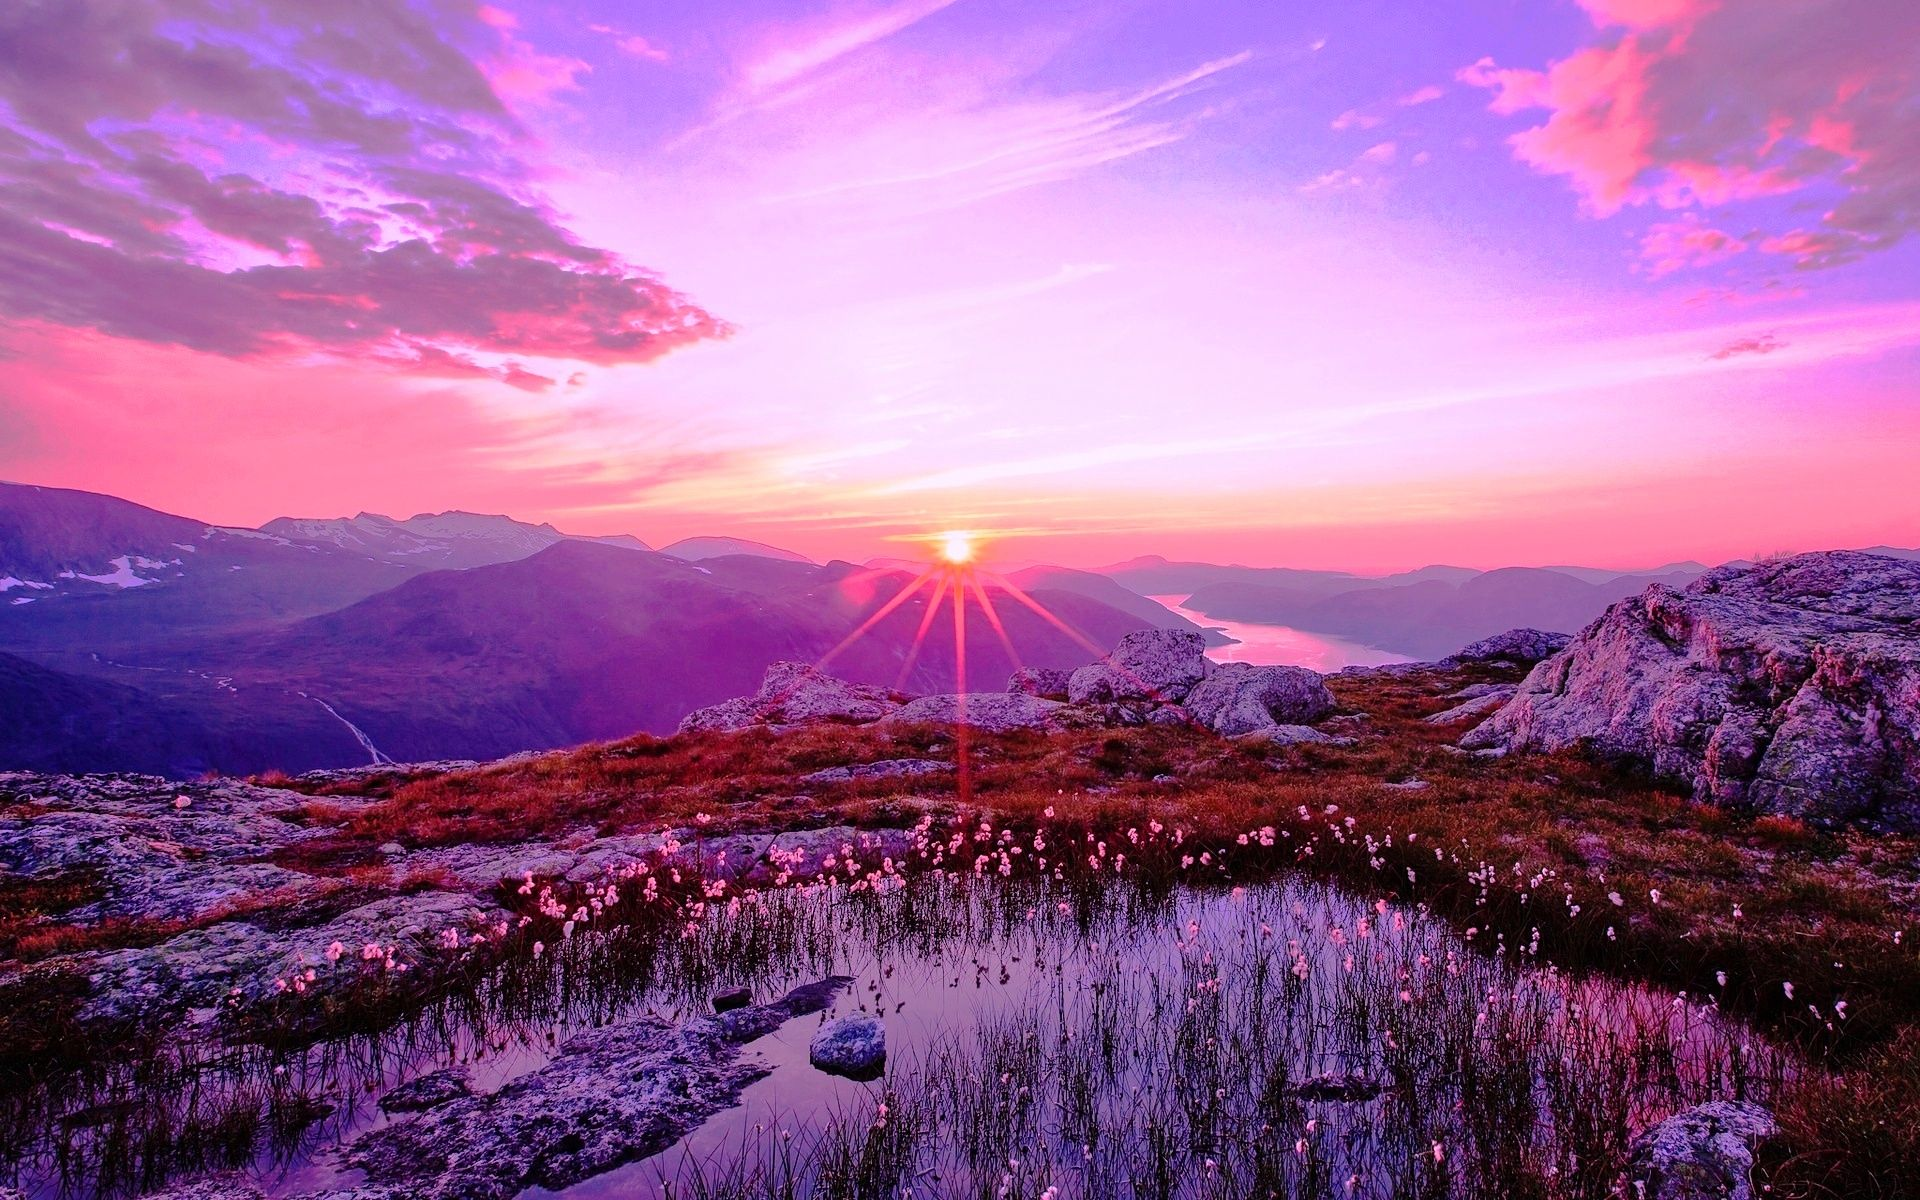 Purple Sunset Wallpapers Top Free Purple Sunset Backgrounds Wallpaperaccess